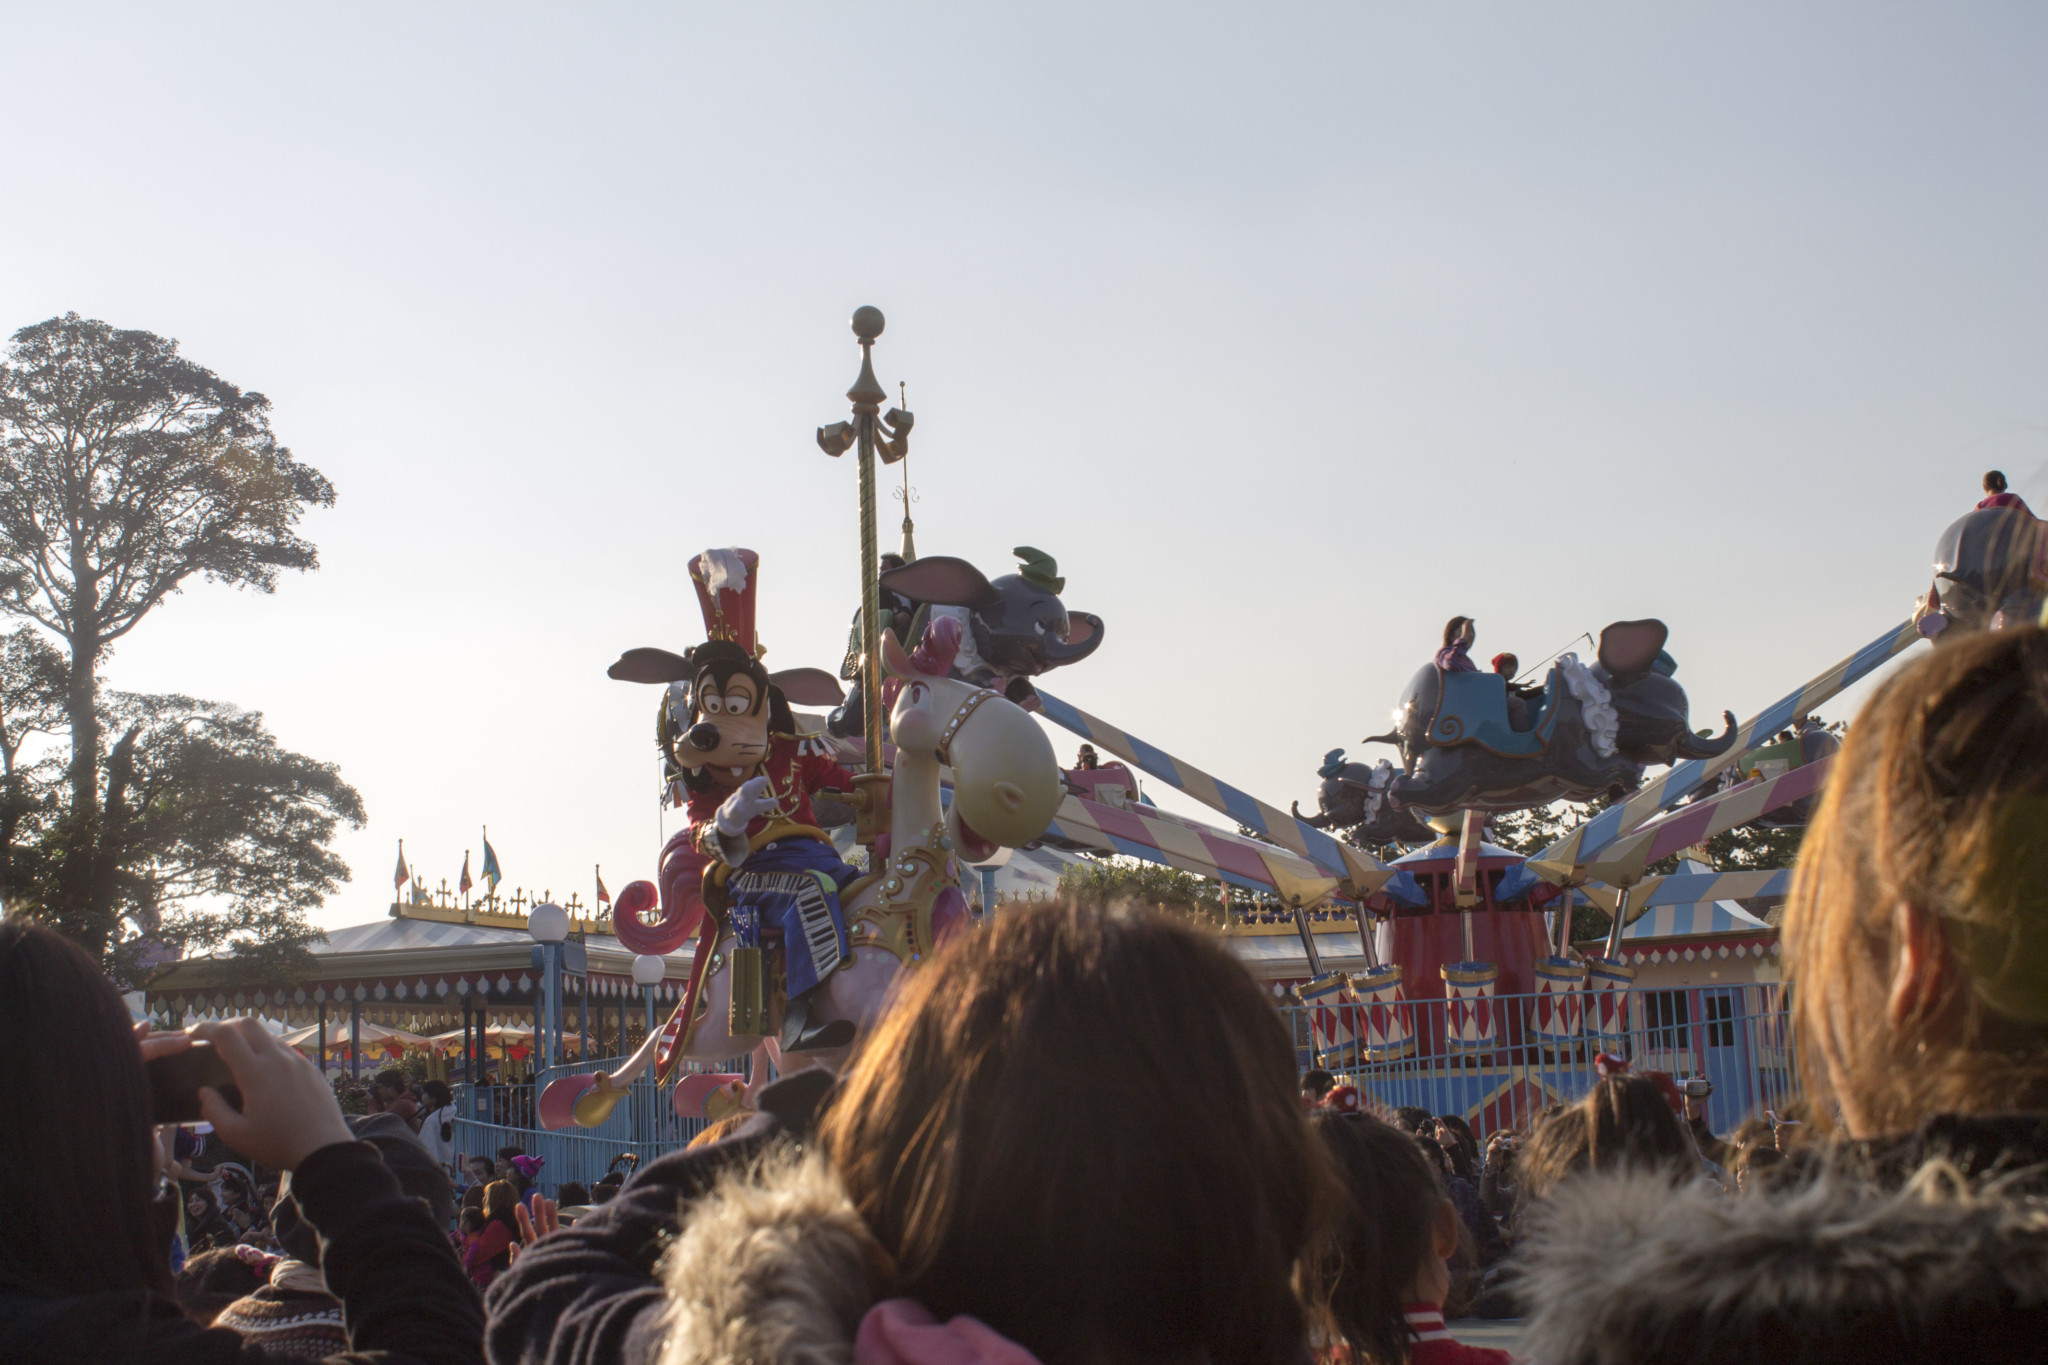 Day 11: Tokyo Disneyland - Strolling Adventures